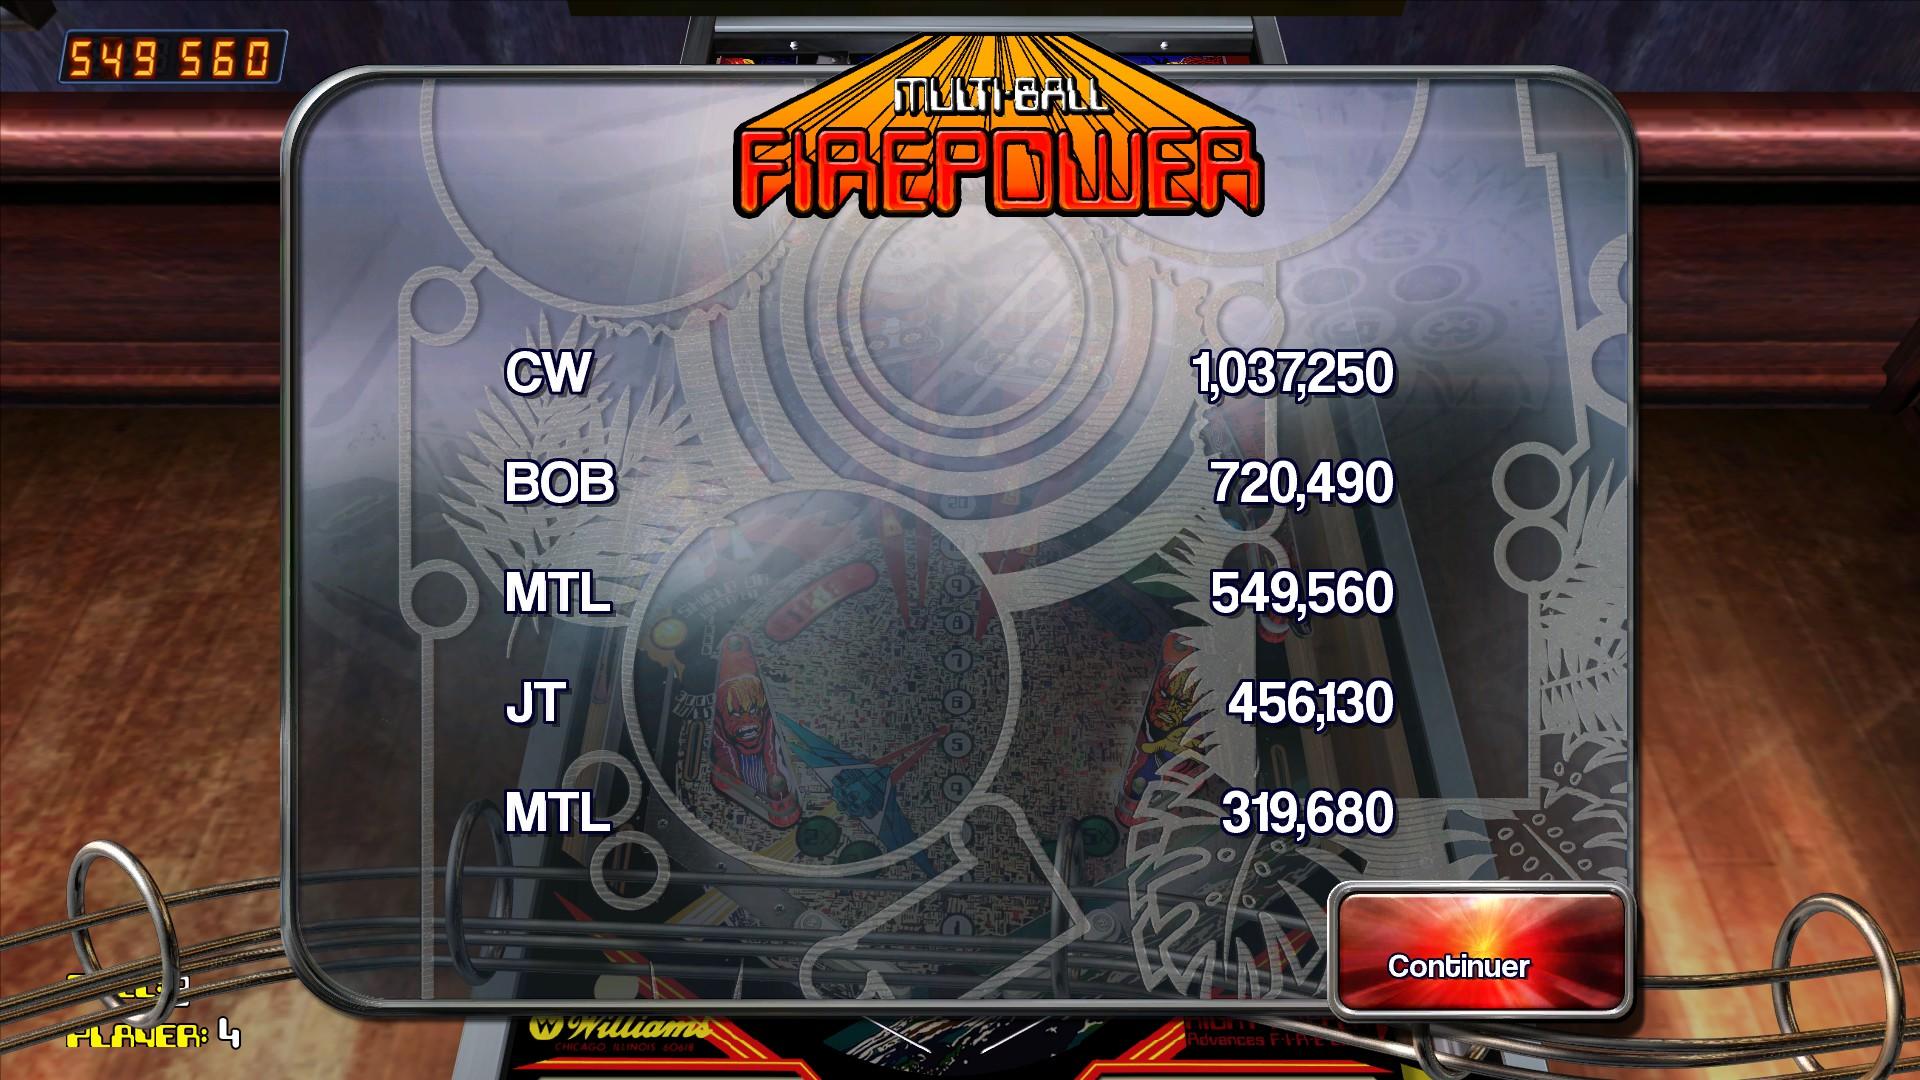 Mantalow: Pinball Arcade: Firepower (PC) 549,560 points on 2015-08-28 04:48:04